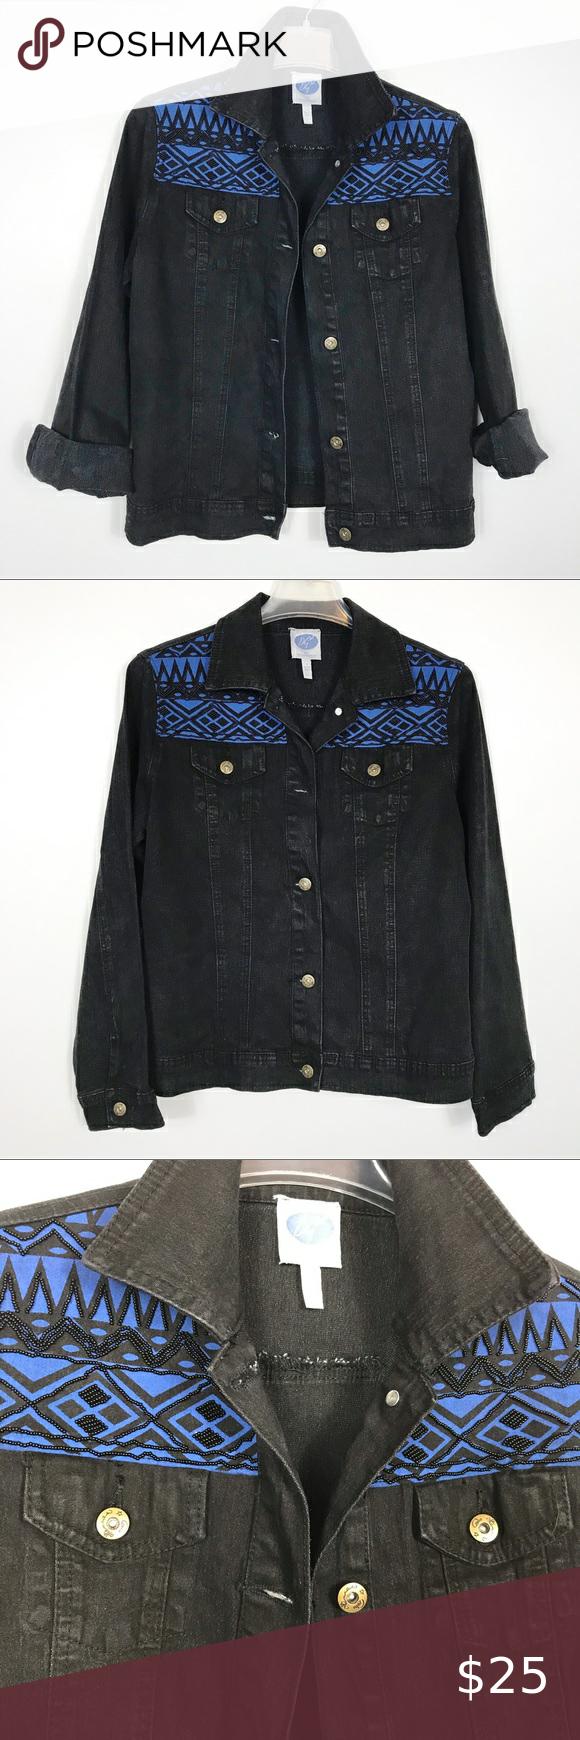 Dg2 Diane Gilman Denim Jacket Denim Jacket Jackets Diane Gilman [ 1740 x 580 Pixel ]